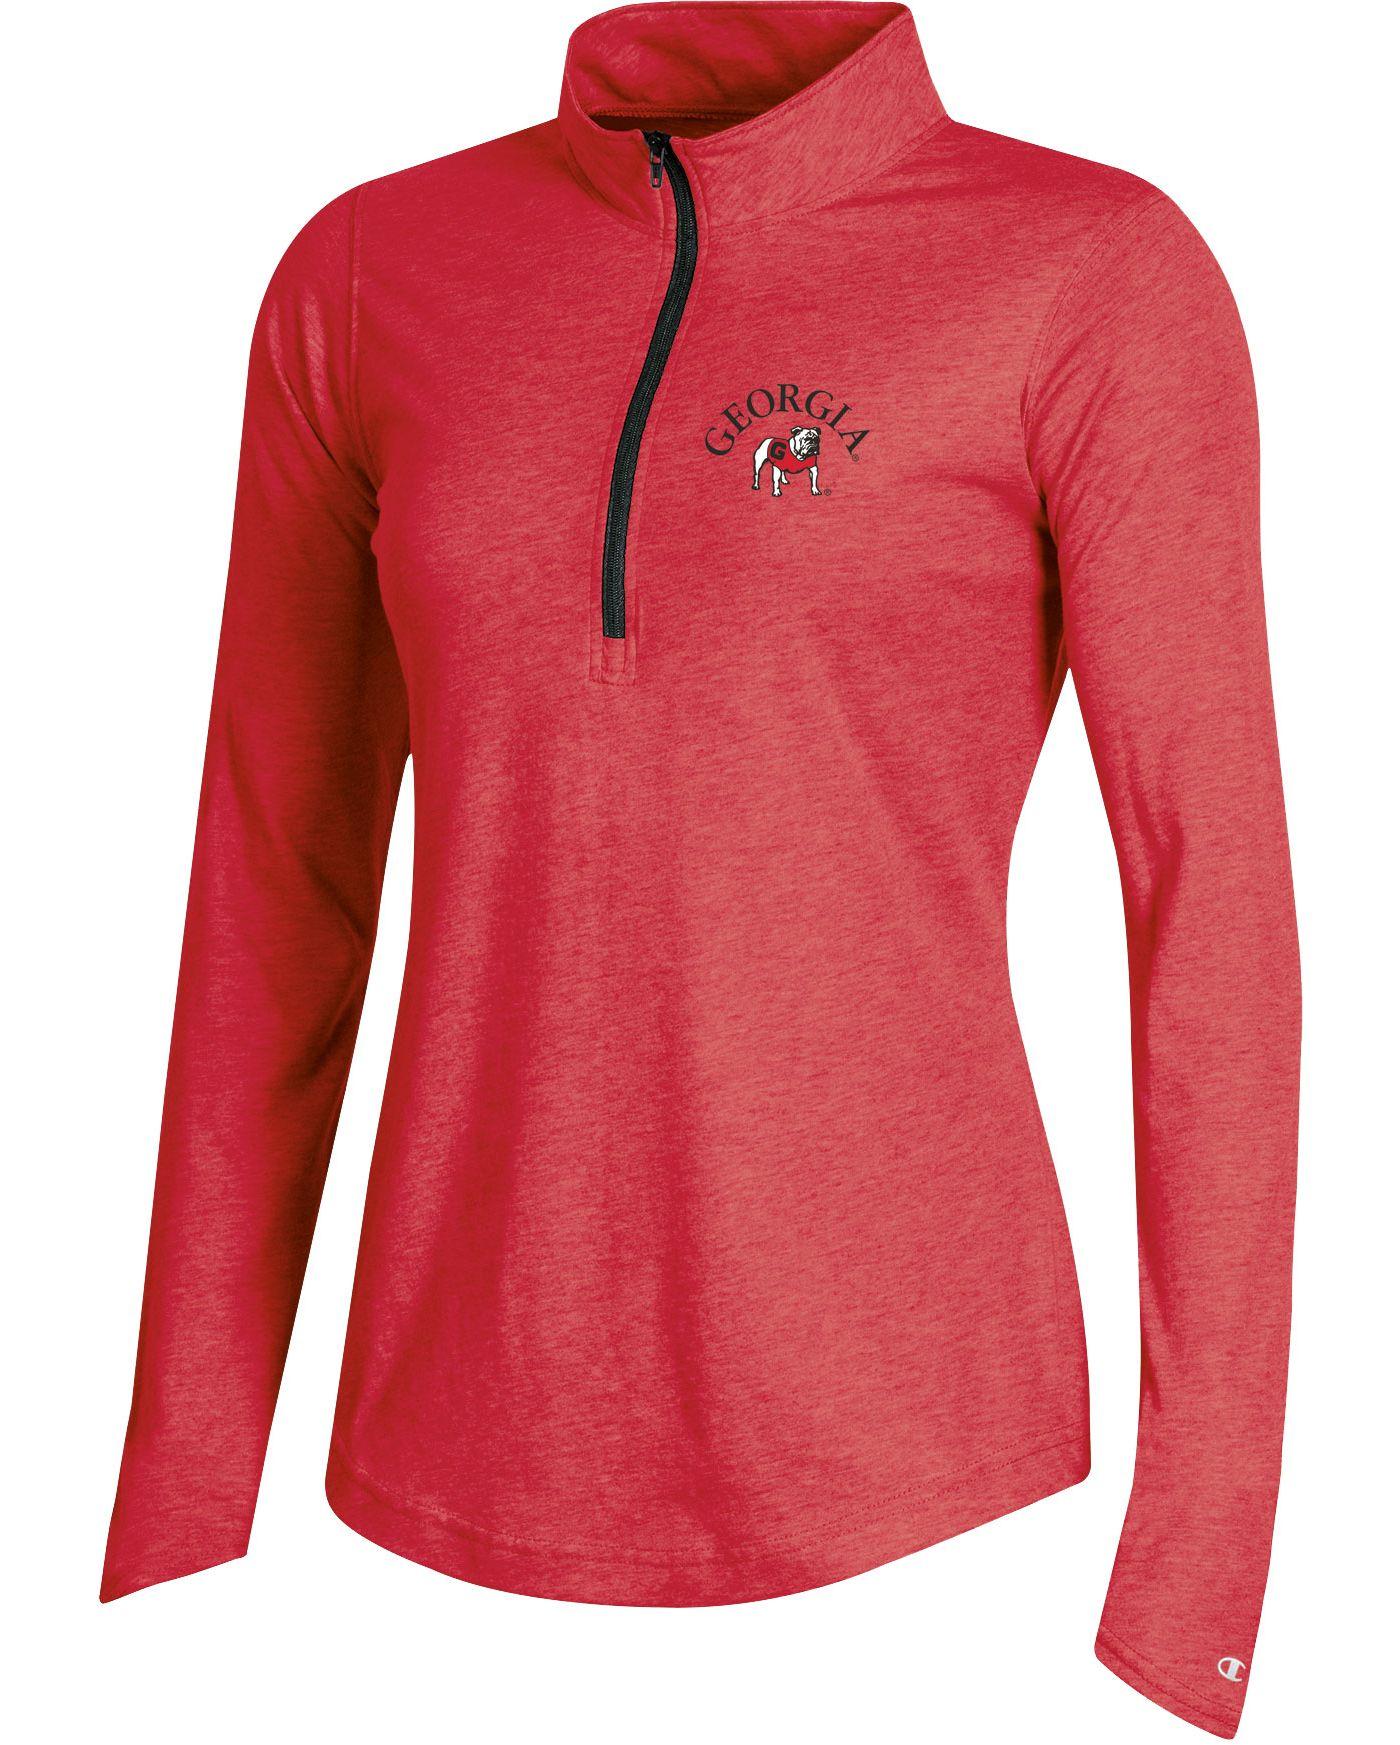 Champion Women's Georgia Bulldogs Red Quarter-Zip Performance Shirt